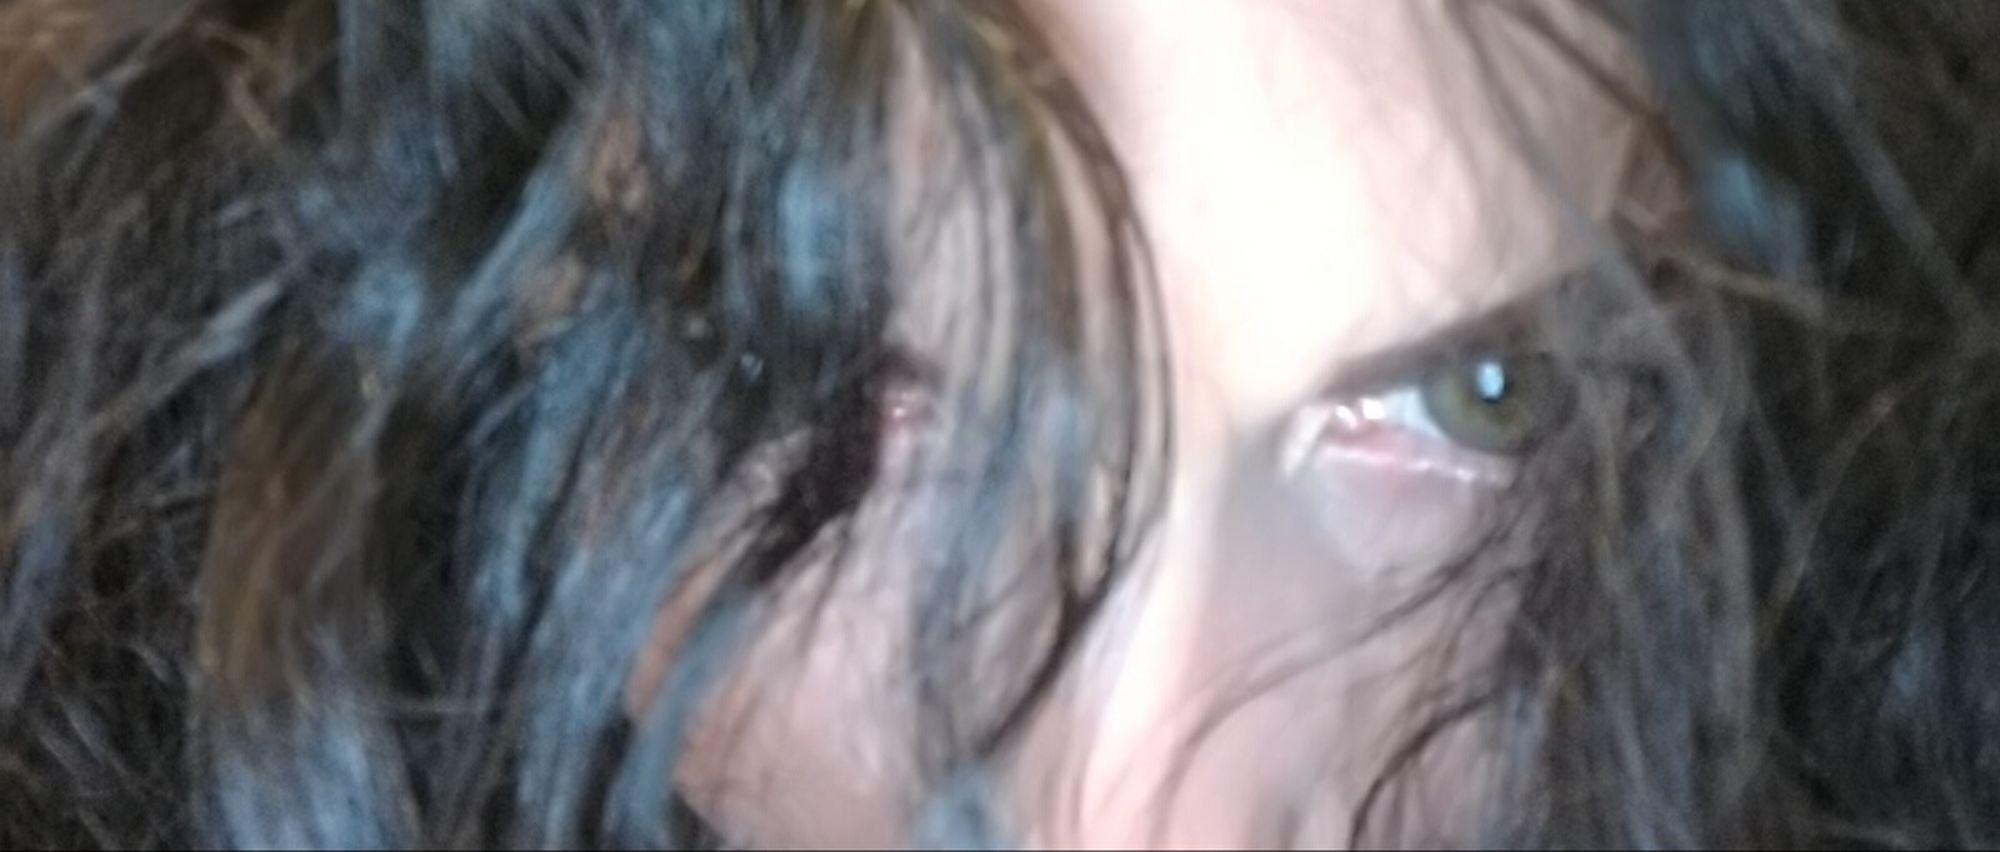 Eye One Woman Only Only Women One Person Human Face Human Eye Women Beautiful Woman Front View Beautiful One Young Woman Only Eye Looking At Camera Beautiful ♥ Women Around The World Beauty In Nature Eyes Watching You Eyes Green Eyes Green You Already Know Eyes Green ♡♥ Eyes Green <3 Young Adult